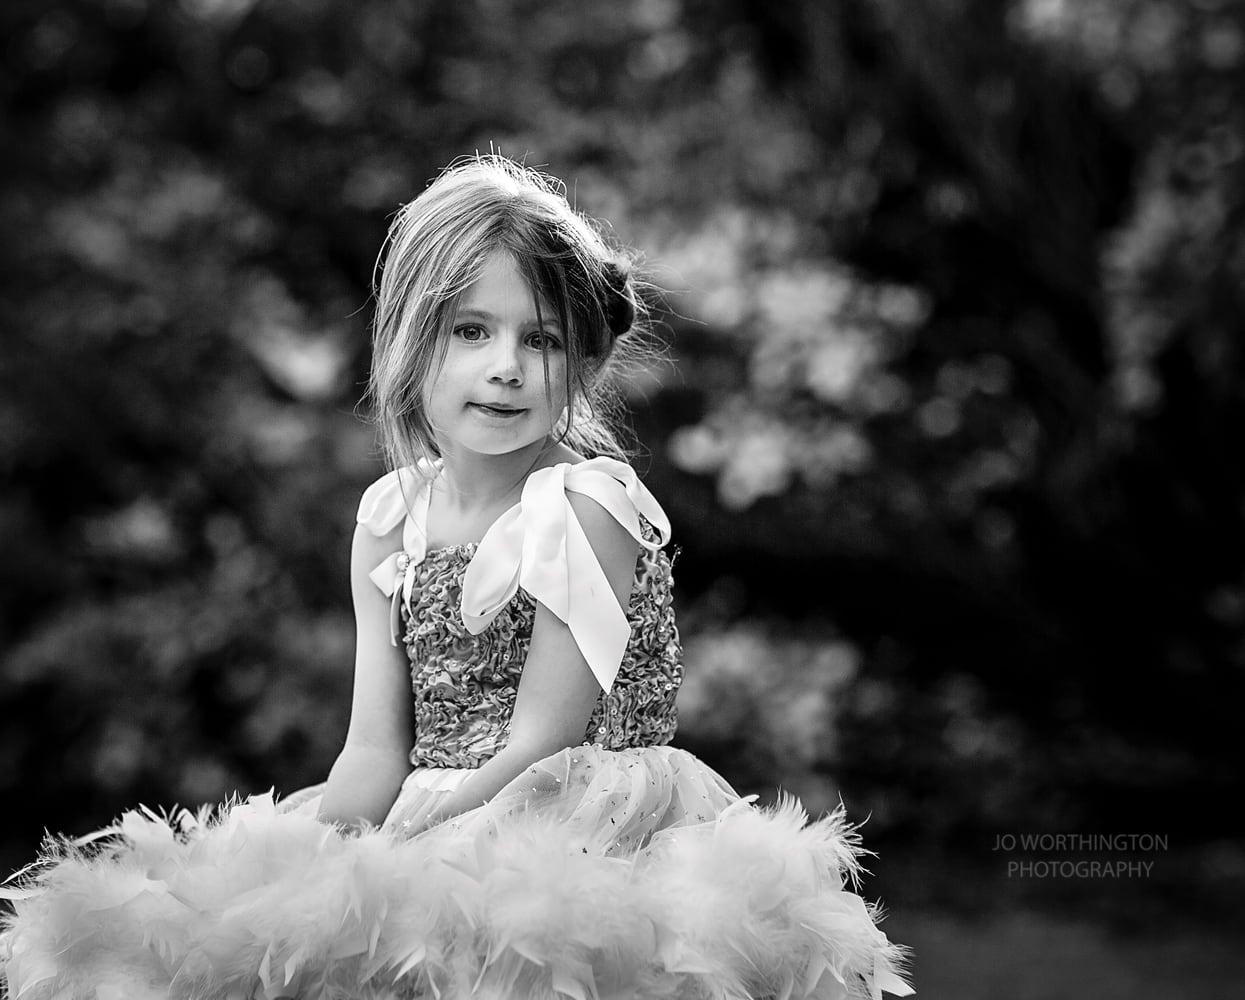 Girl in tutu Exbury Gardens black and white photo